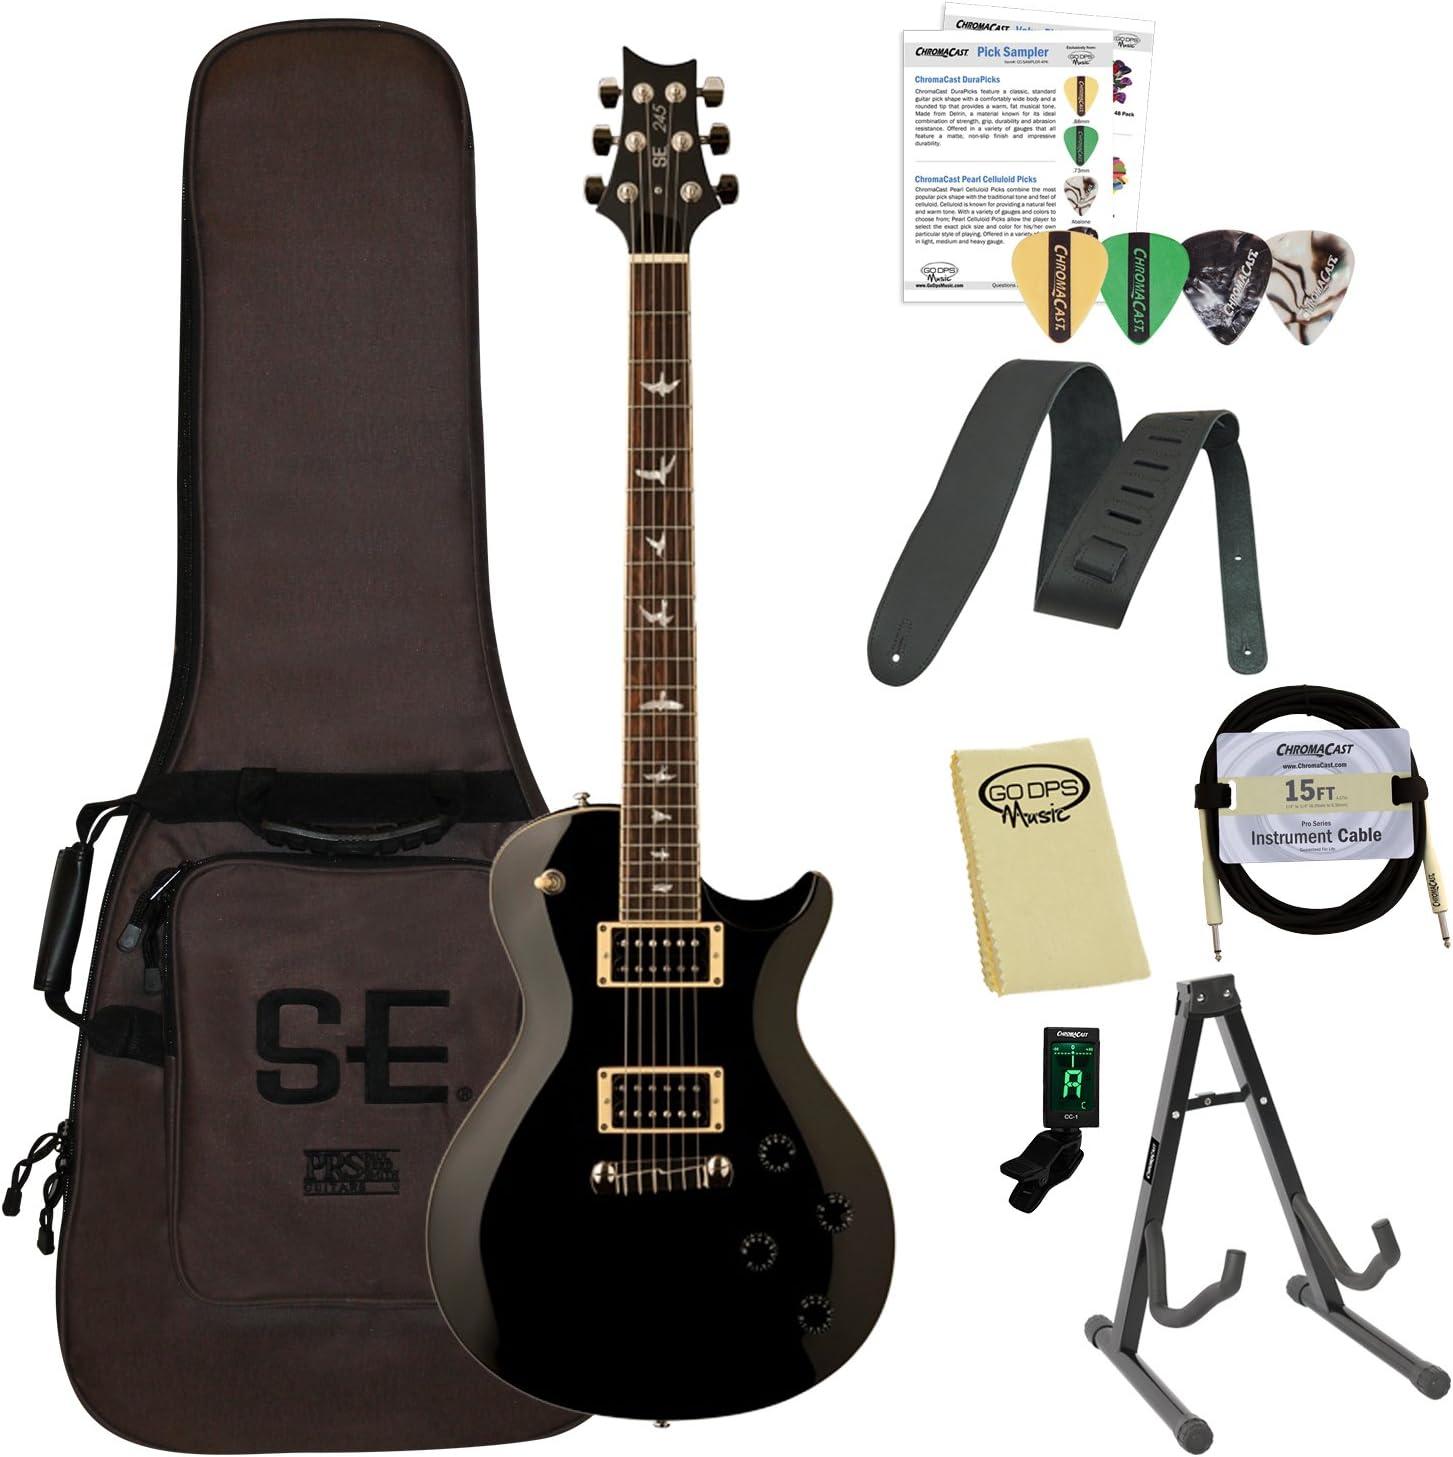 Paul Reed Smith guitarras 245stbk-kit01 PRS SE 245 Standard negro ...